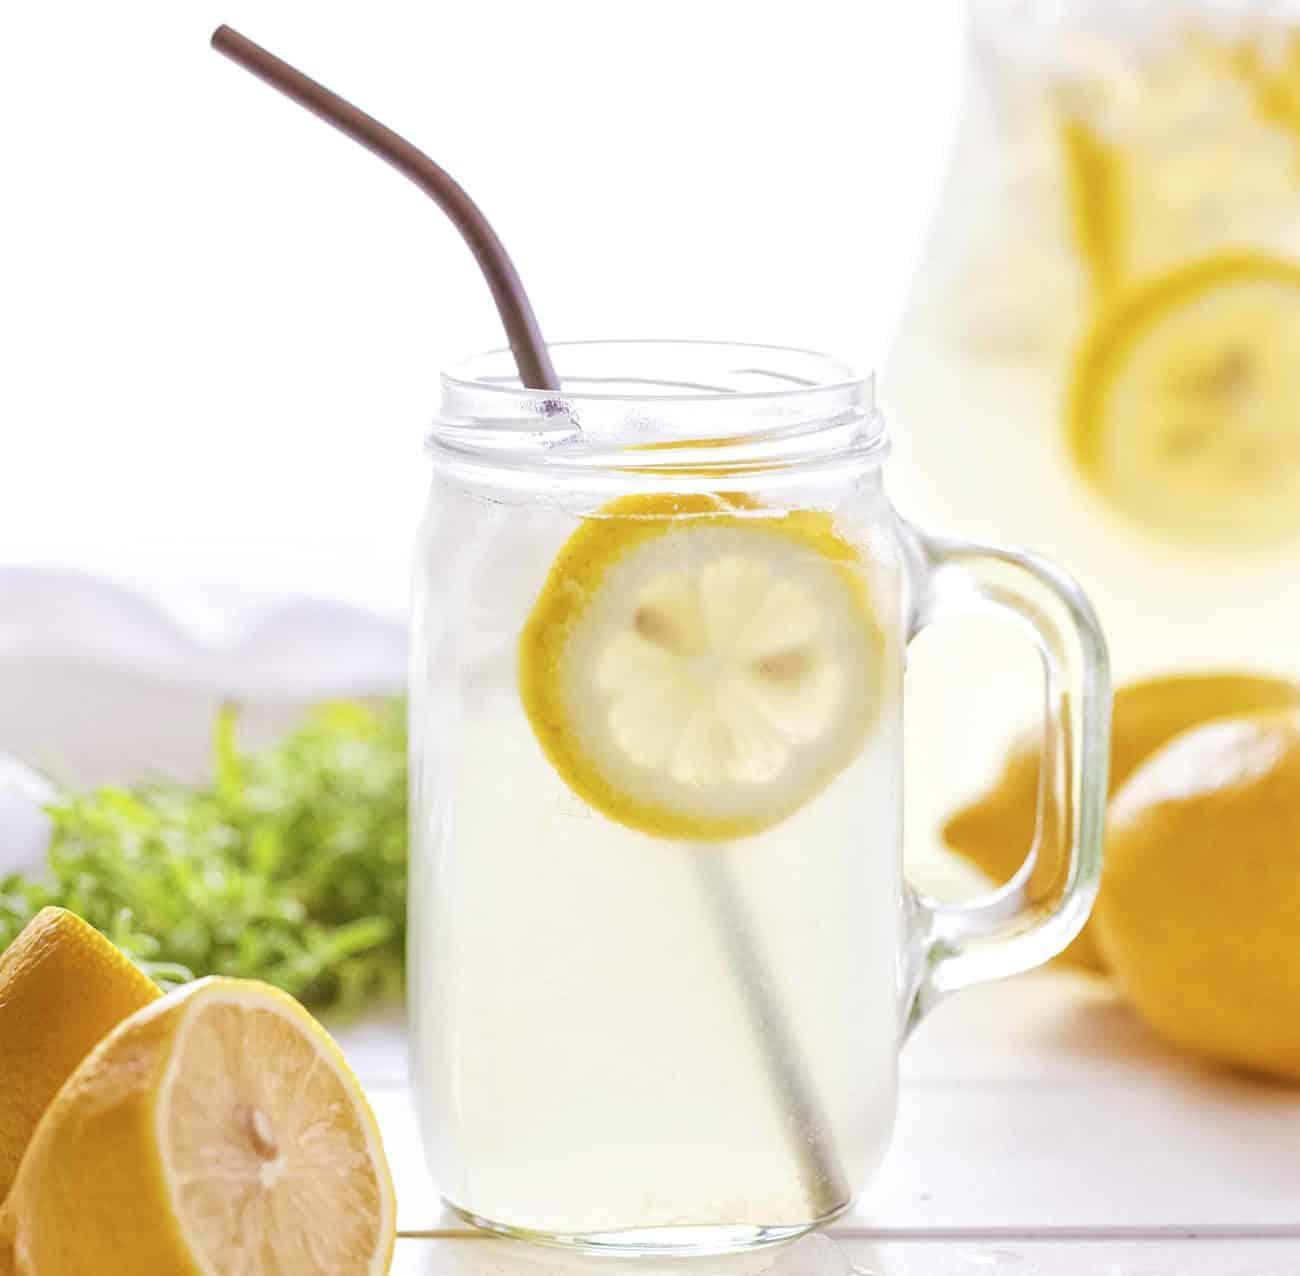 Homemade Lemonade in a Mug with Metal Straw